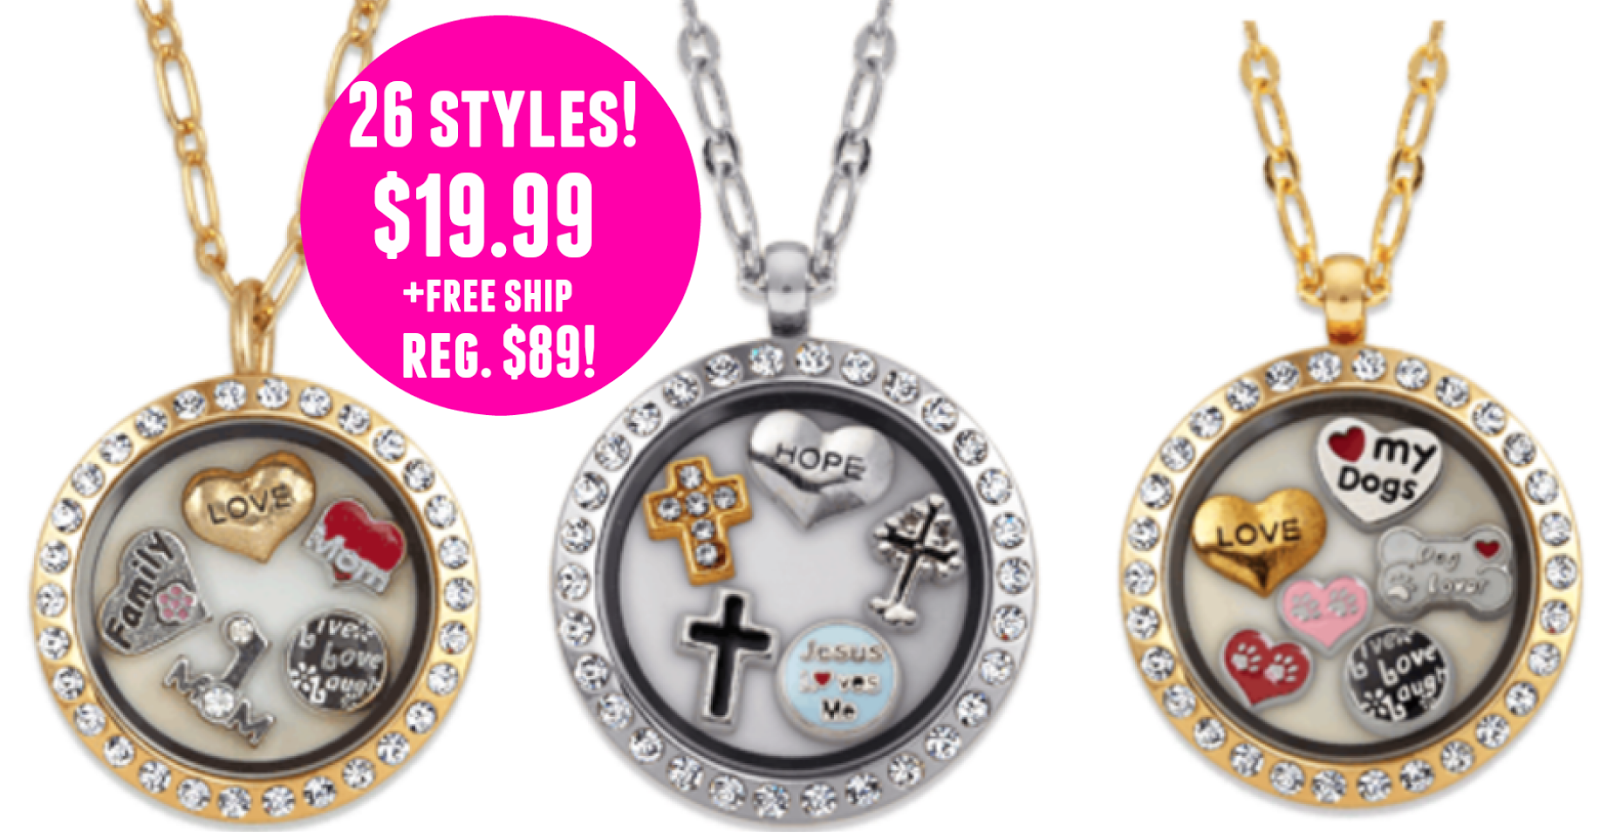 http://www.thebinderladies.com/2014/11/limoges-jewelry-rhinstone-locket-charm.html#.VFpkbb7duyM